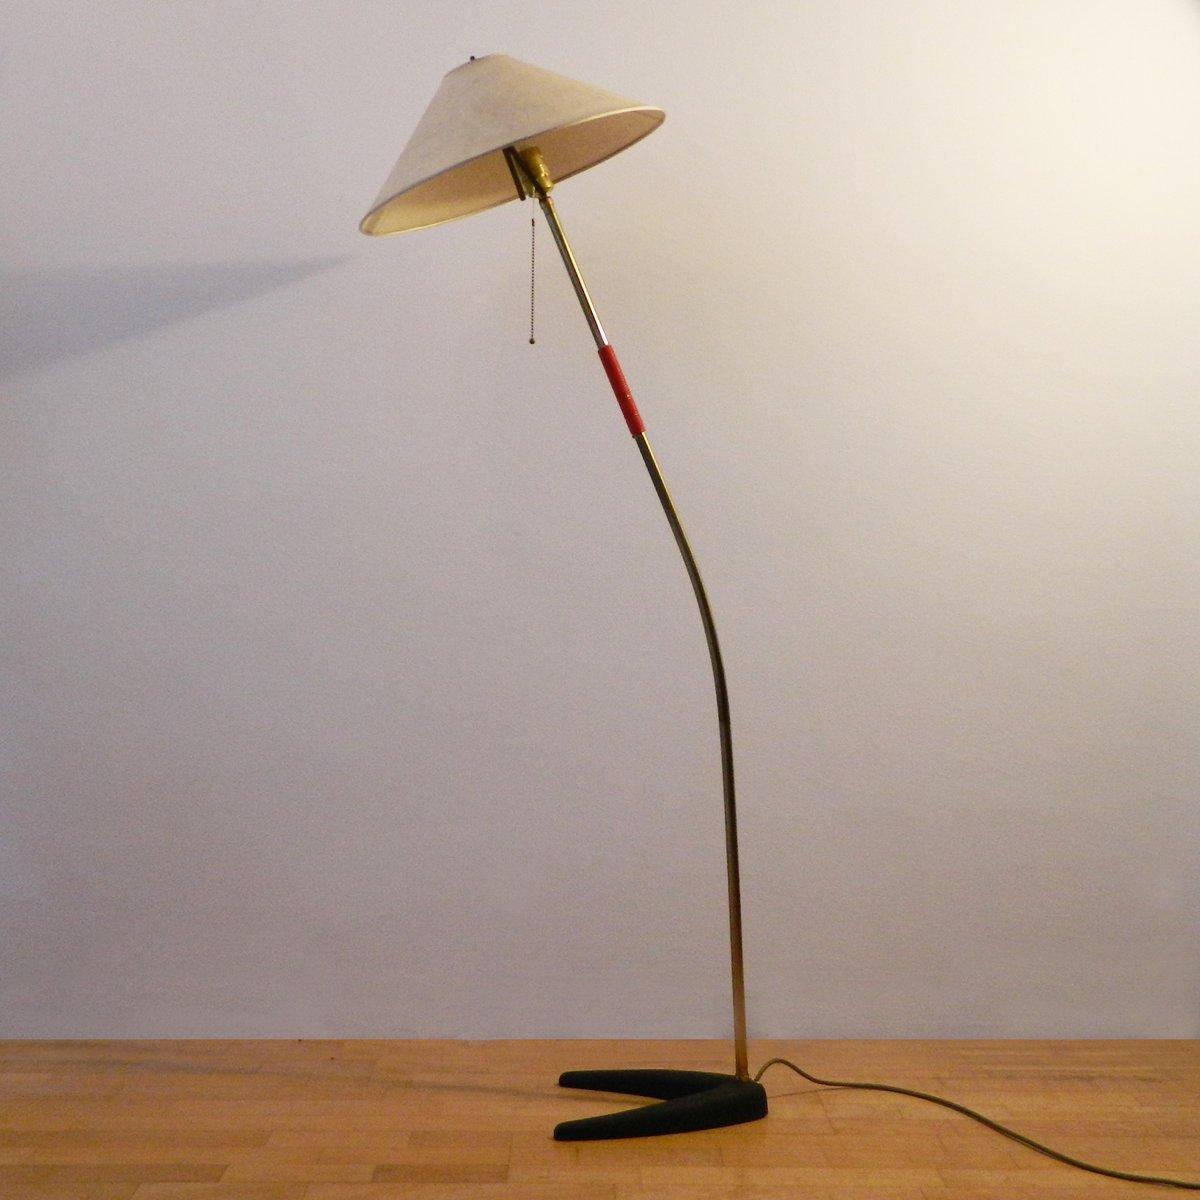 Brass And Cast Iron Floor Lamp By J.T. Kalmar For Kalmar